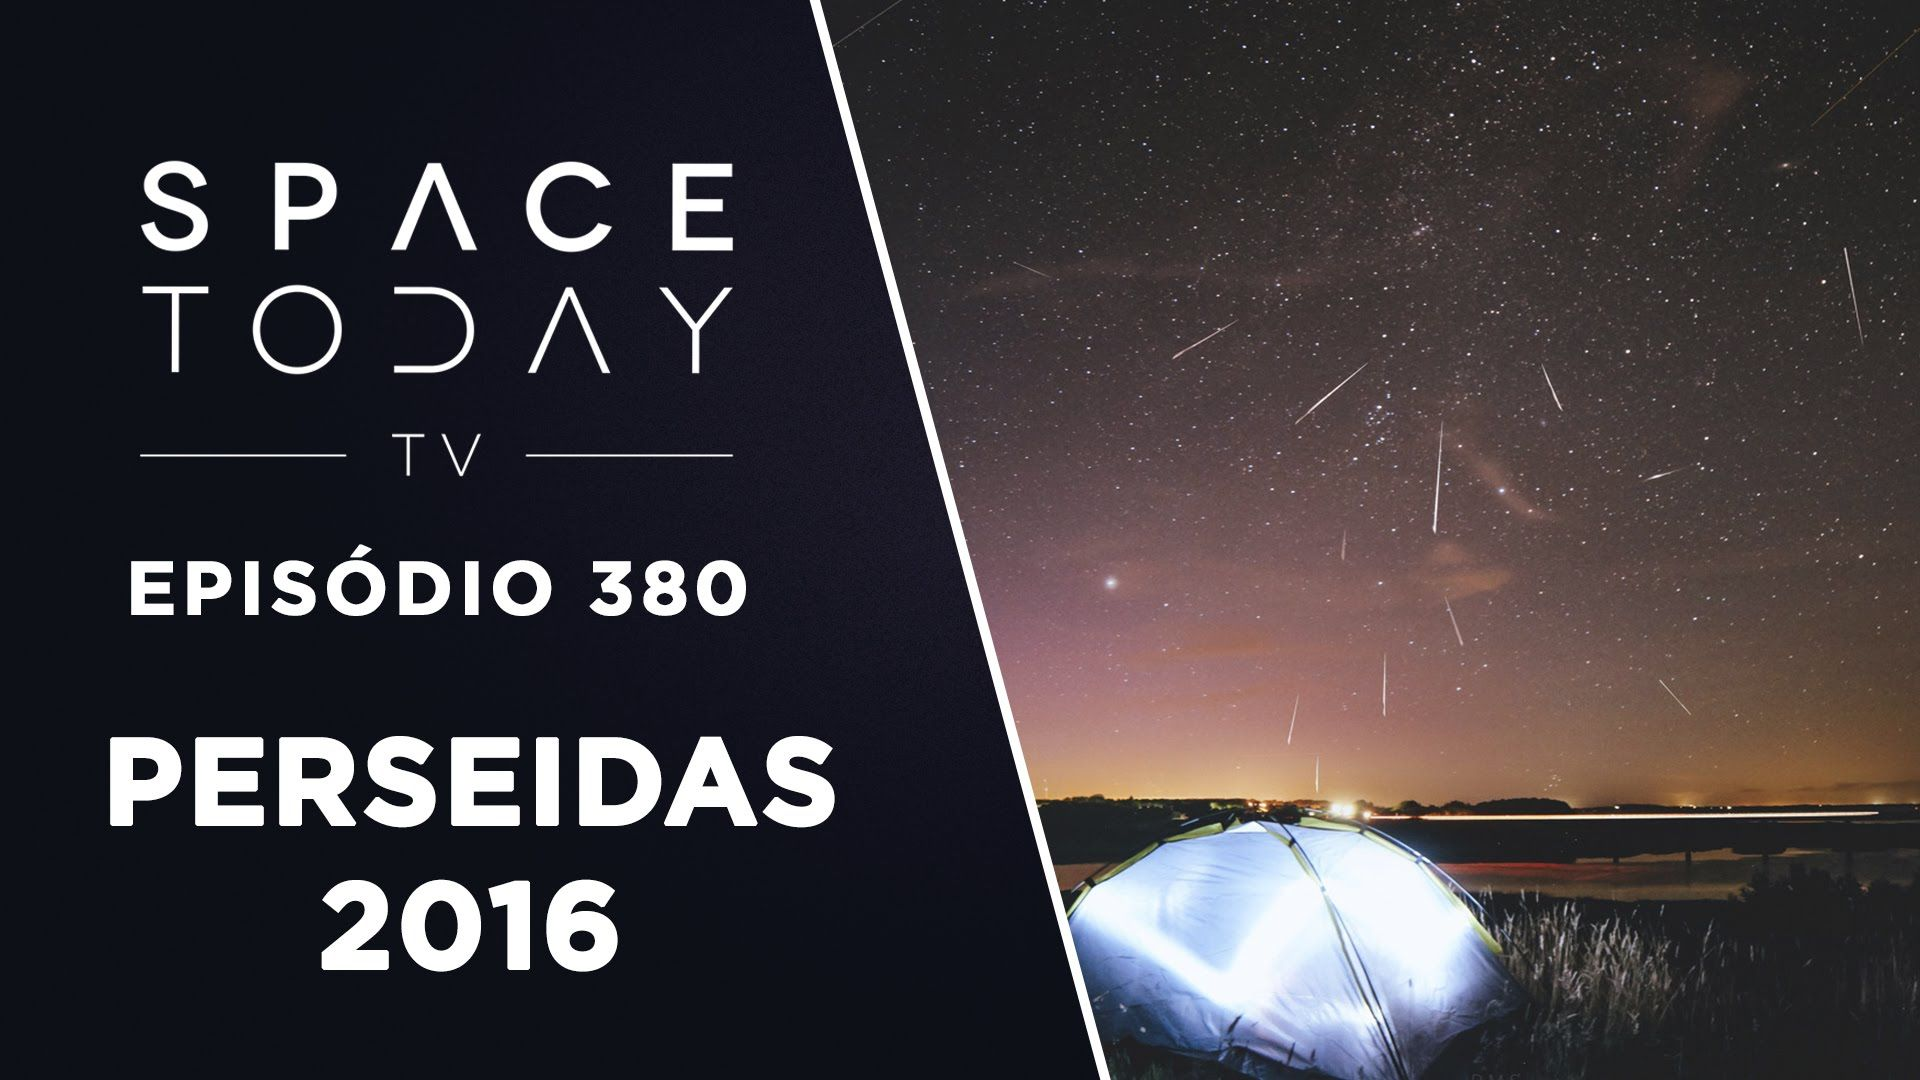 Perseidas 2016 - Space Today TV Ep.380